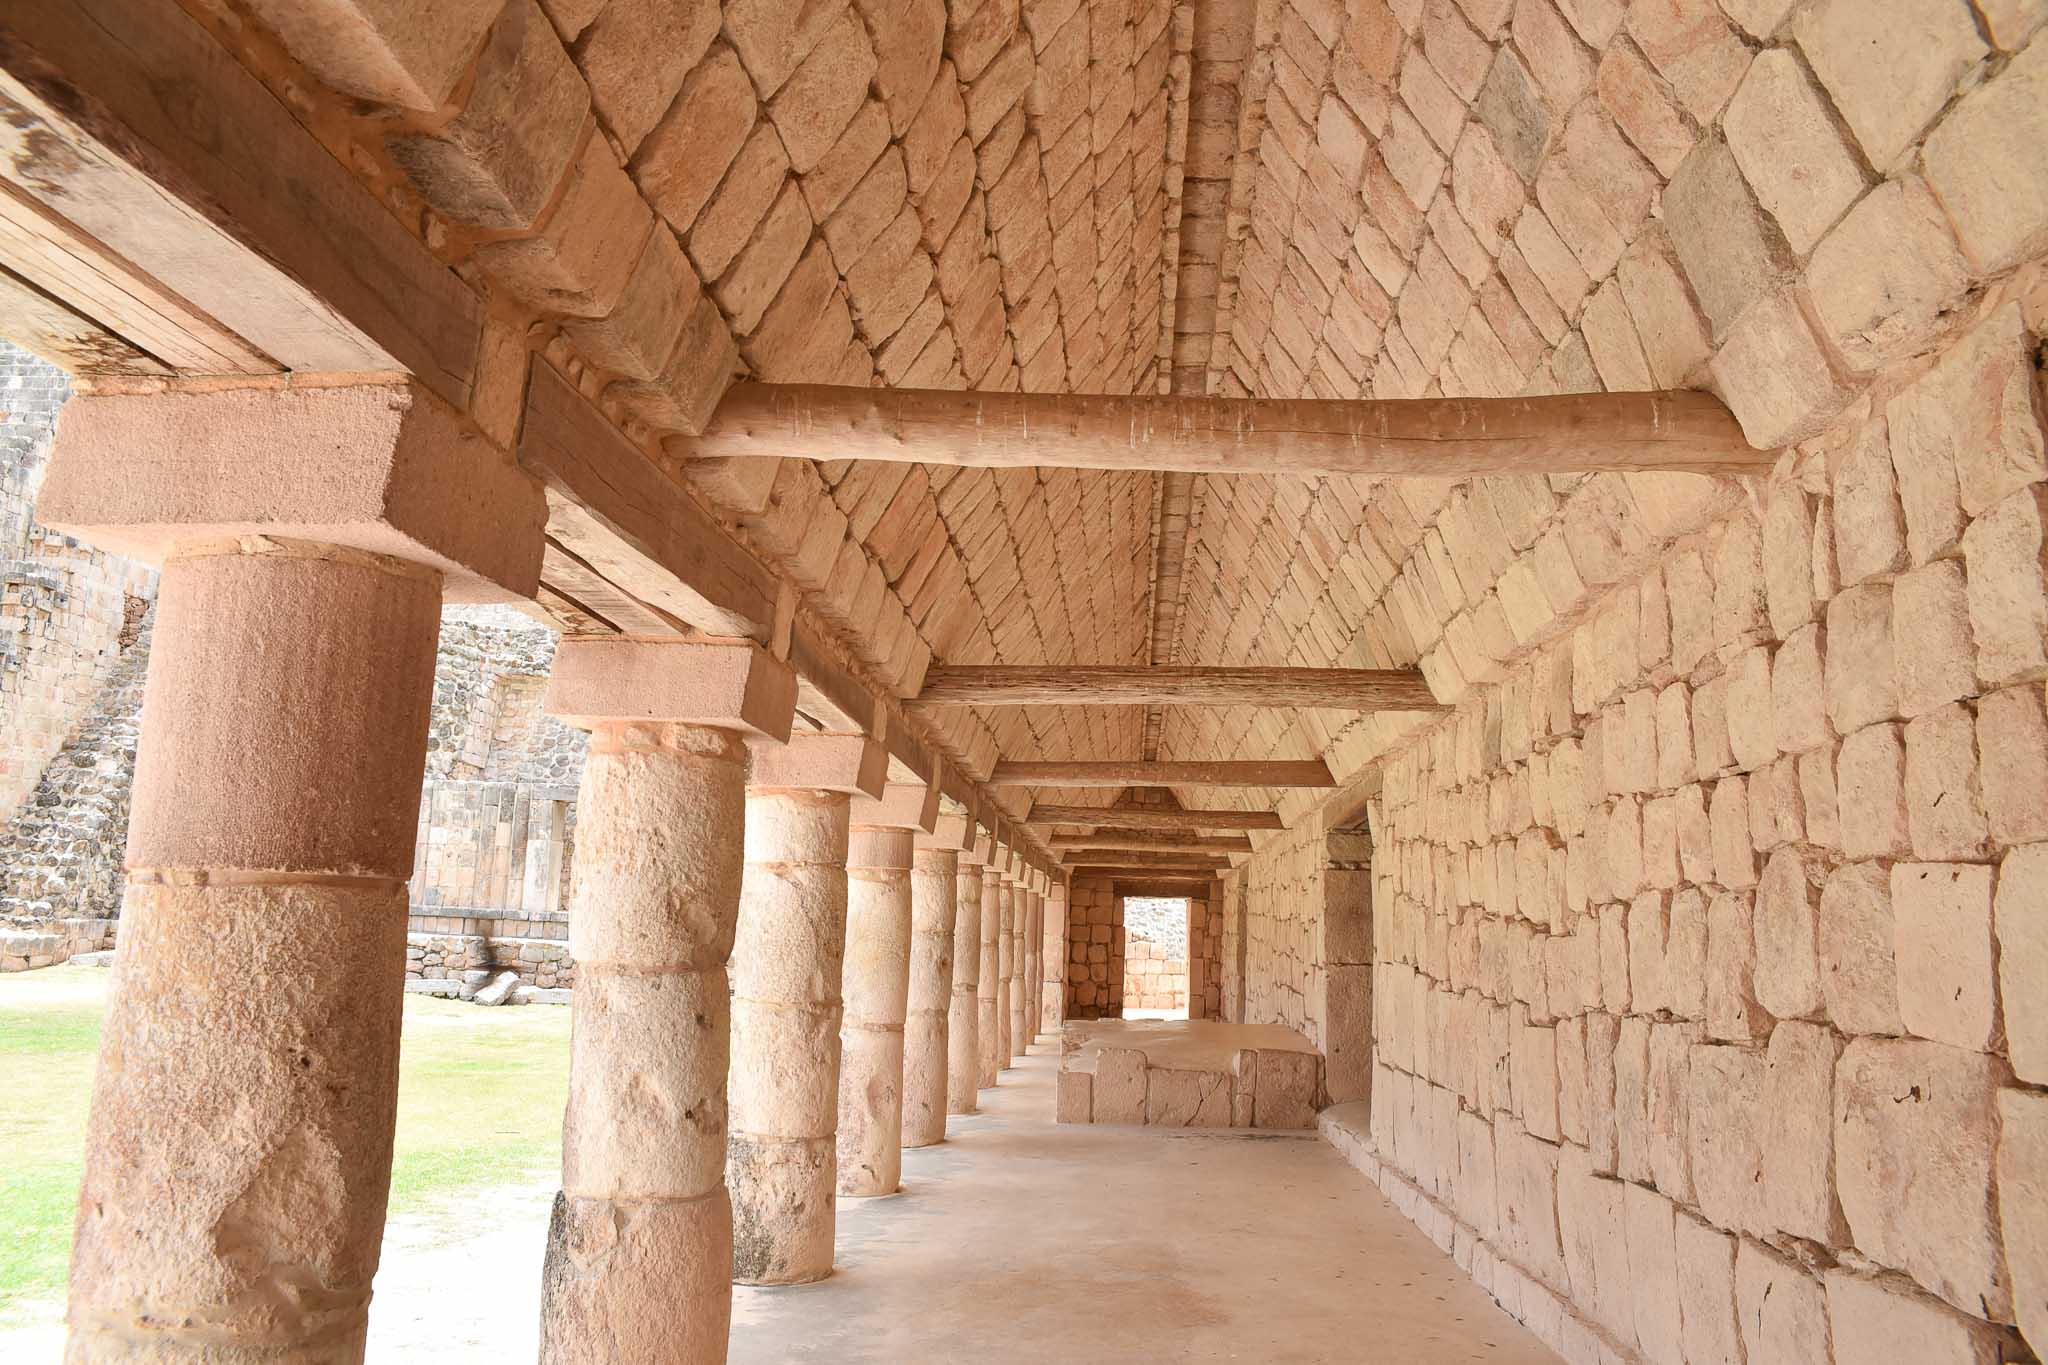 visite ruines maya mexique